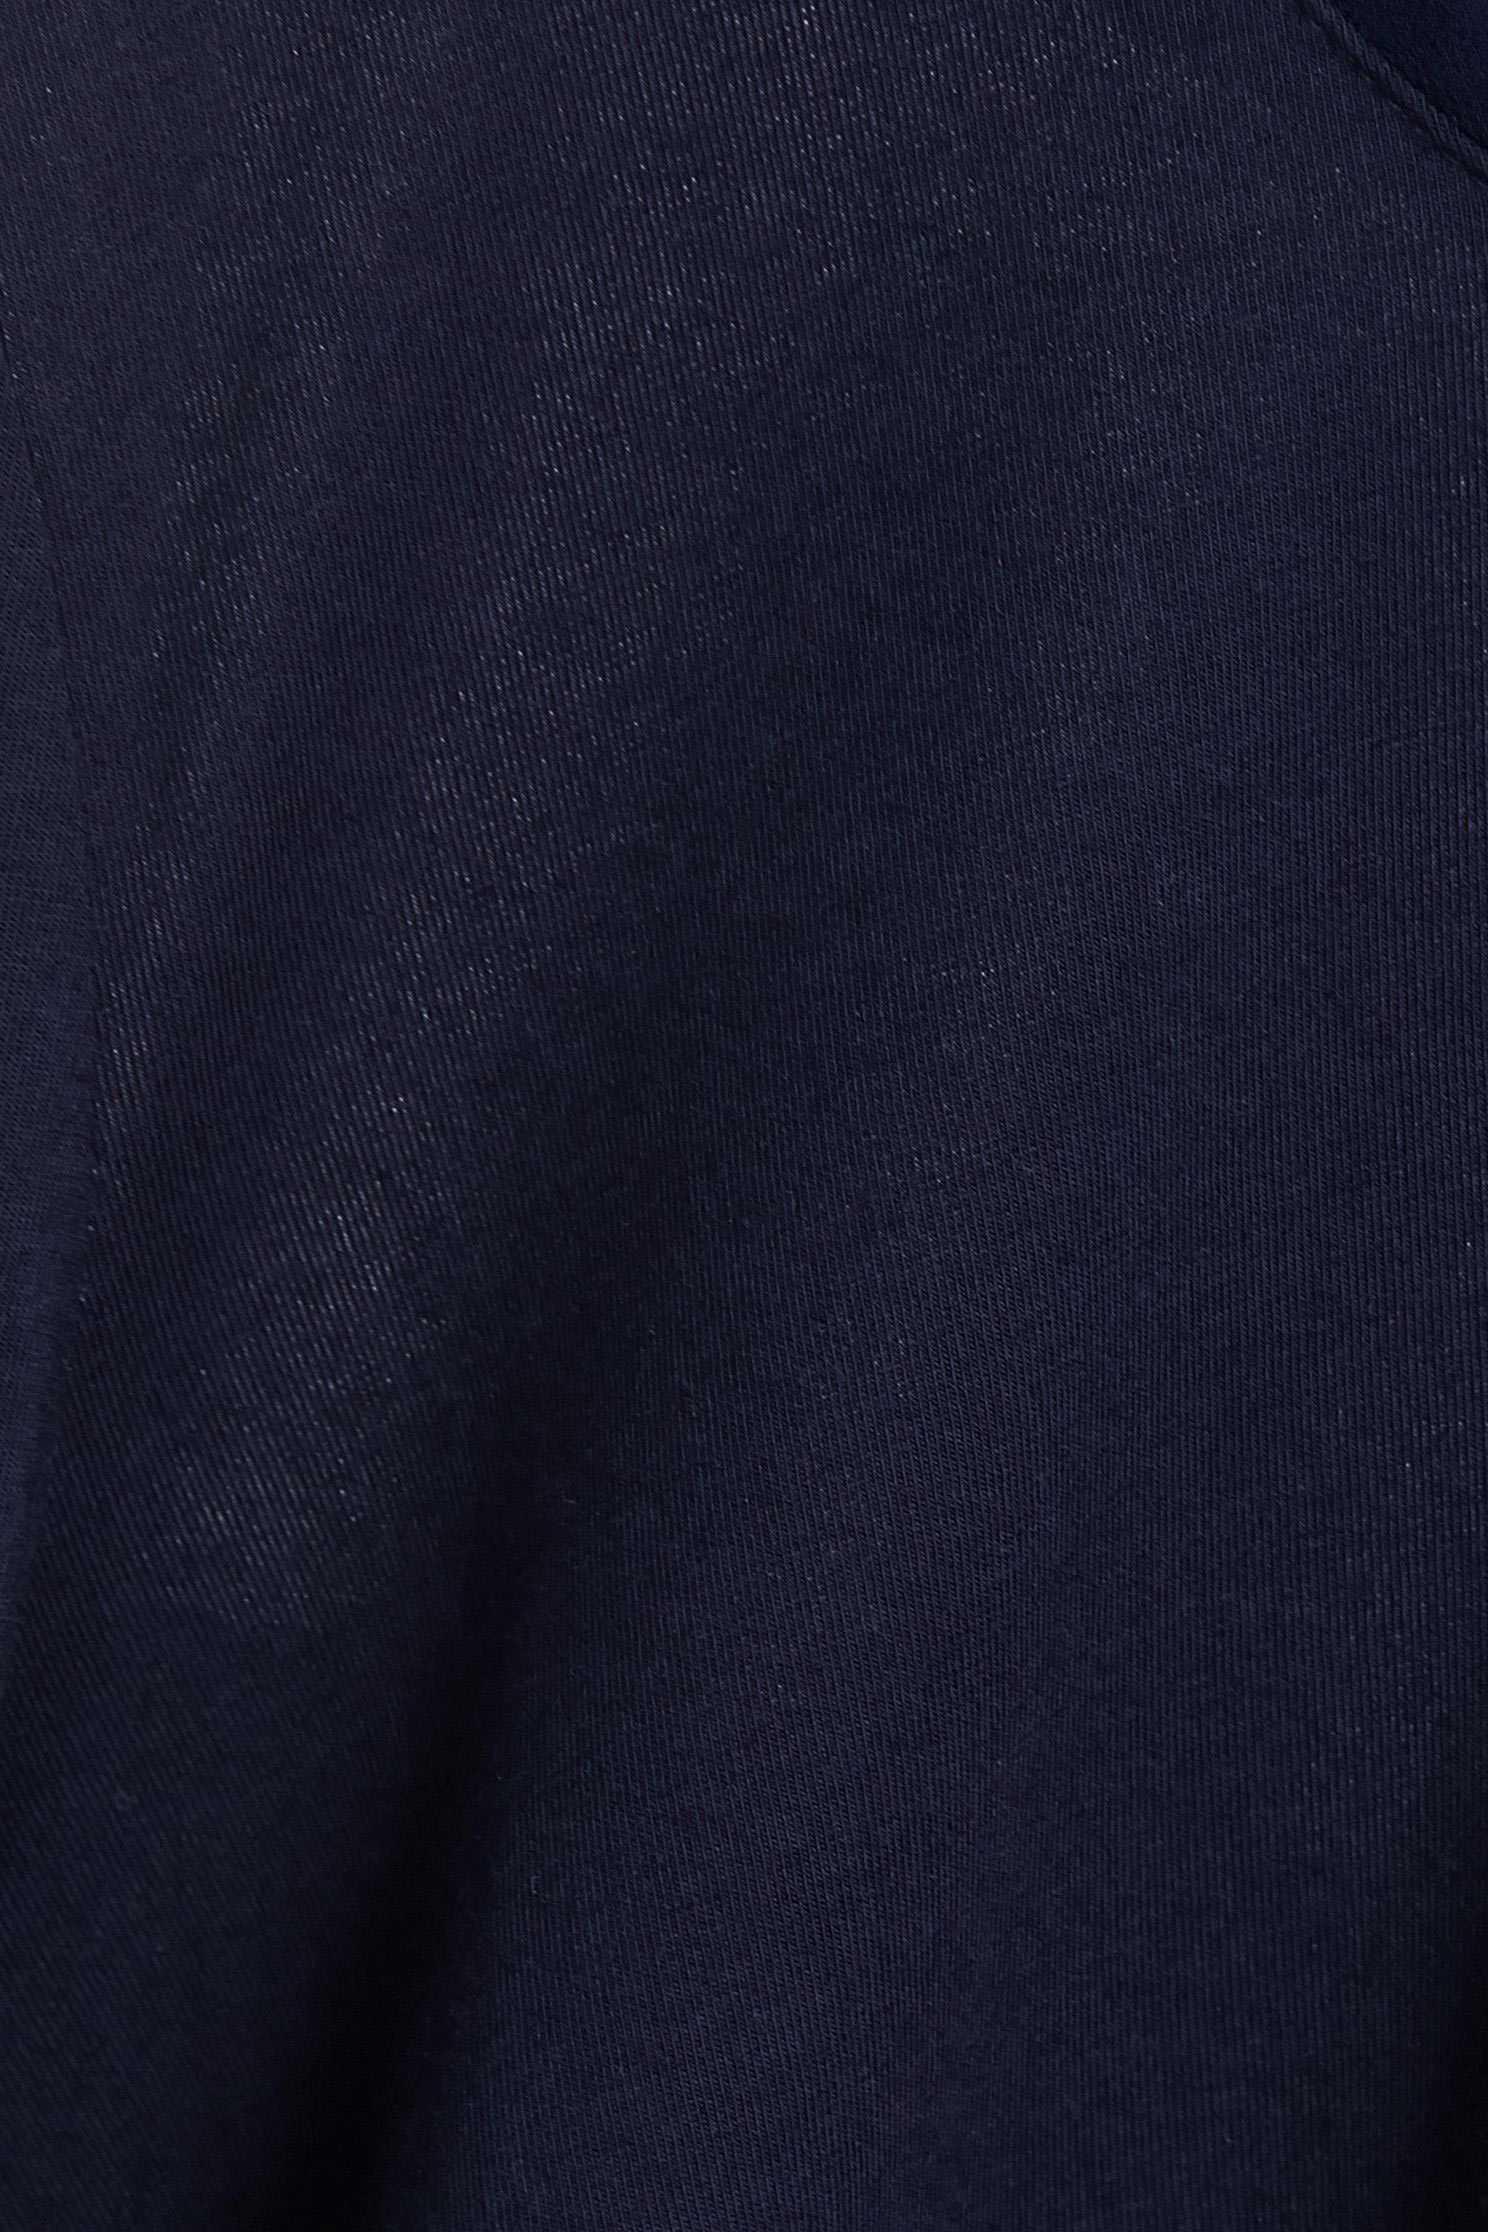 Navy Textured Top,top,roundnecktop,see-throughtop,longsleevetop,chiffon,chiffontop